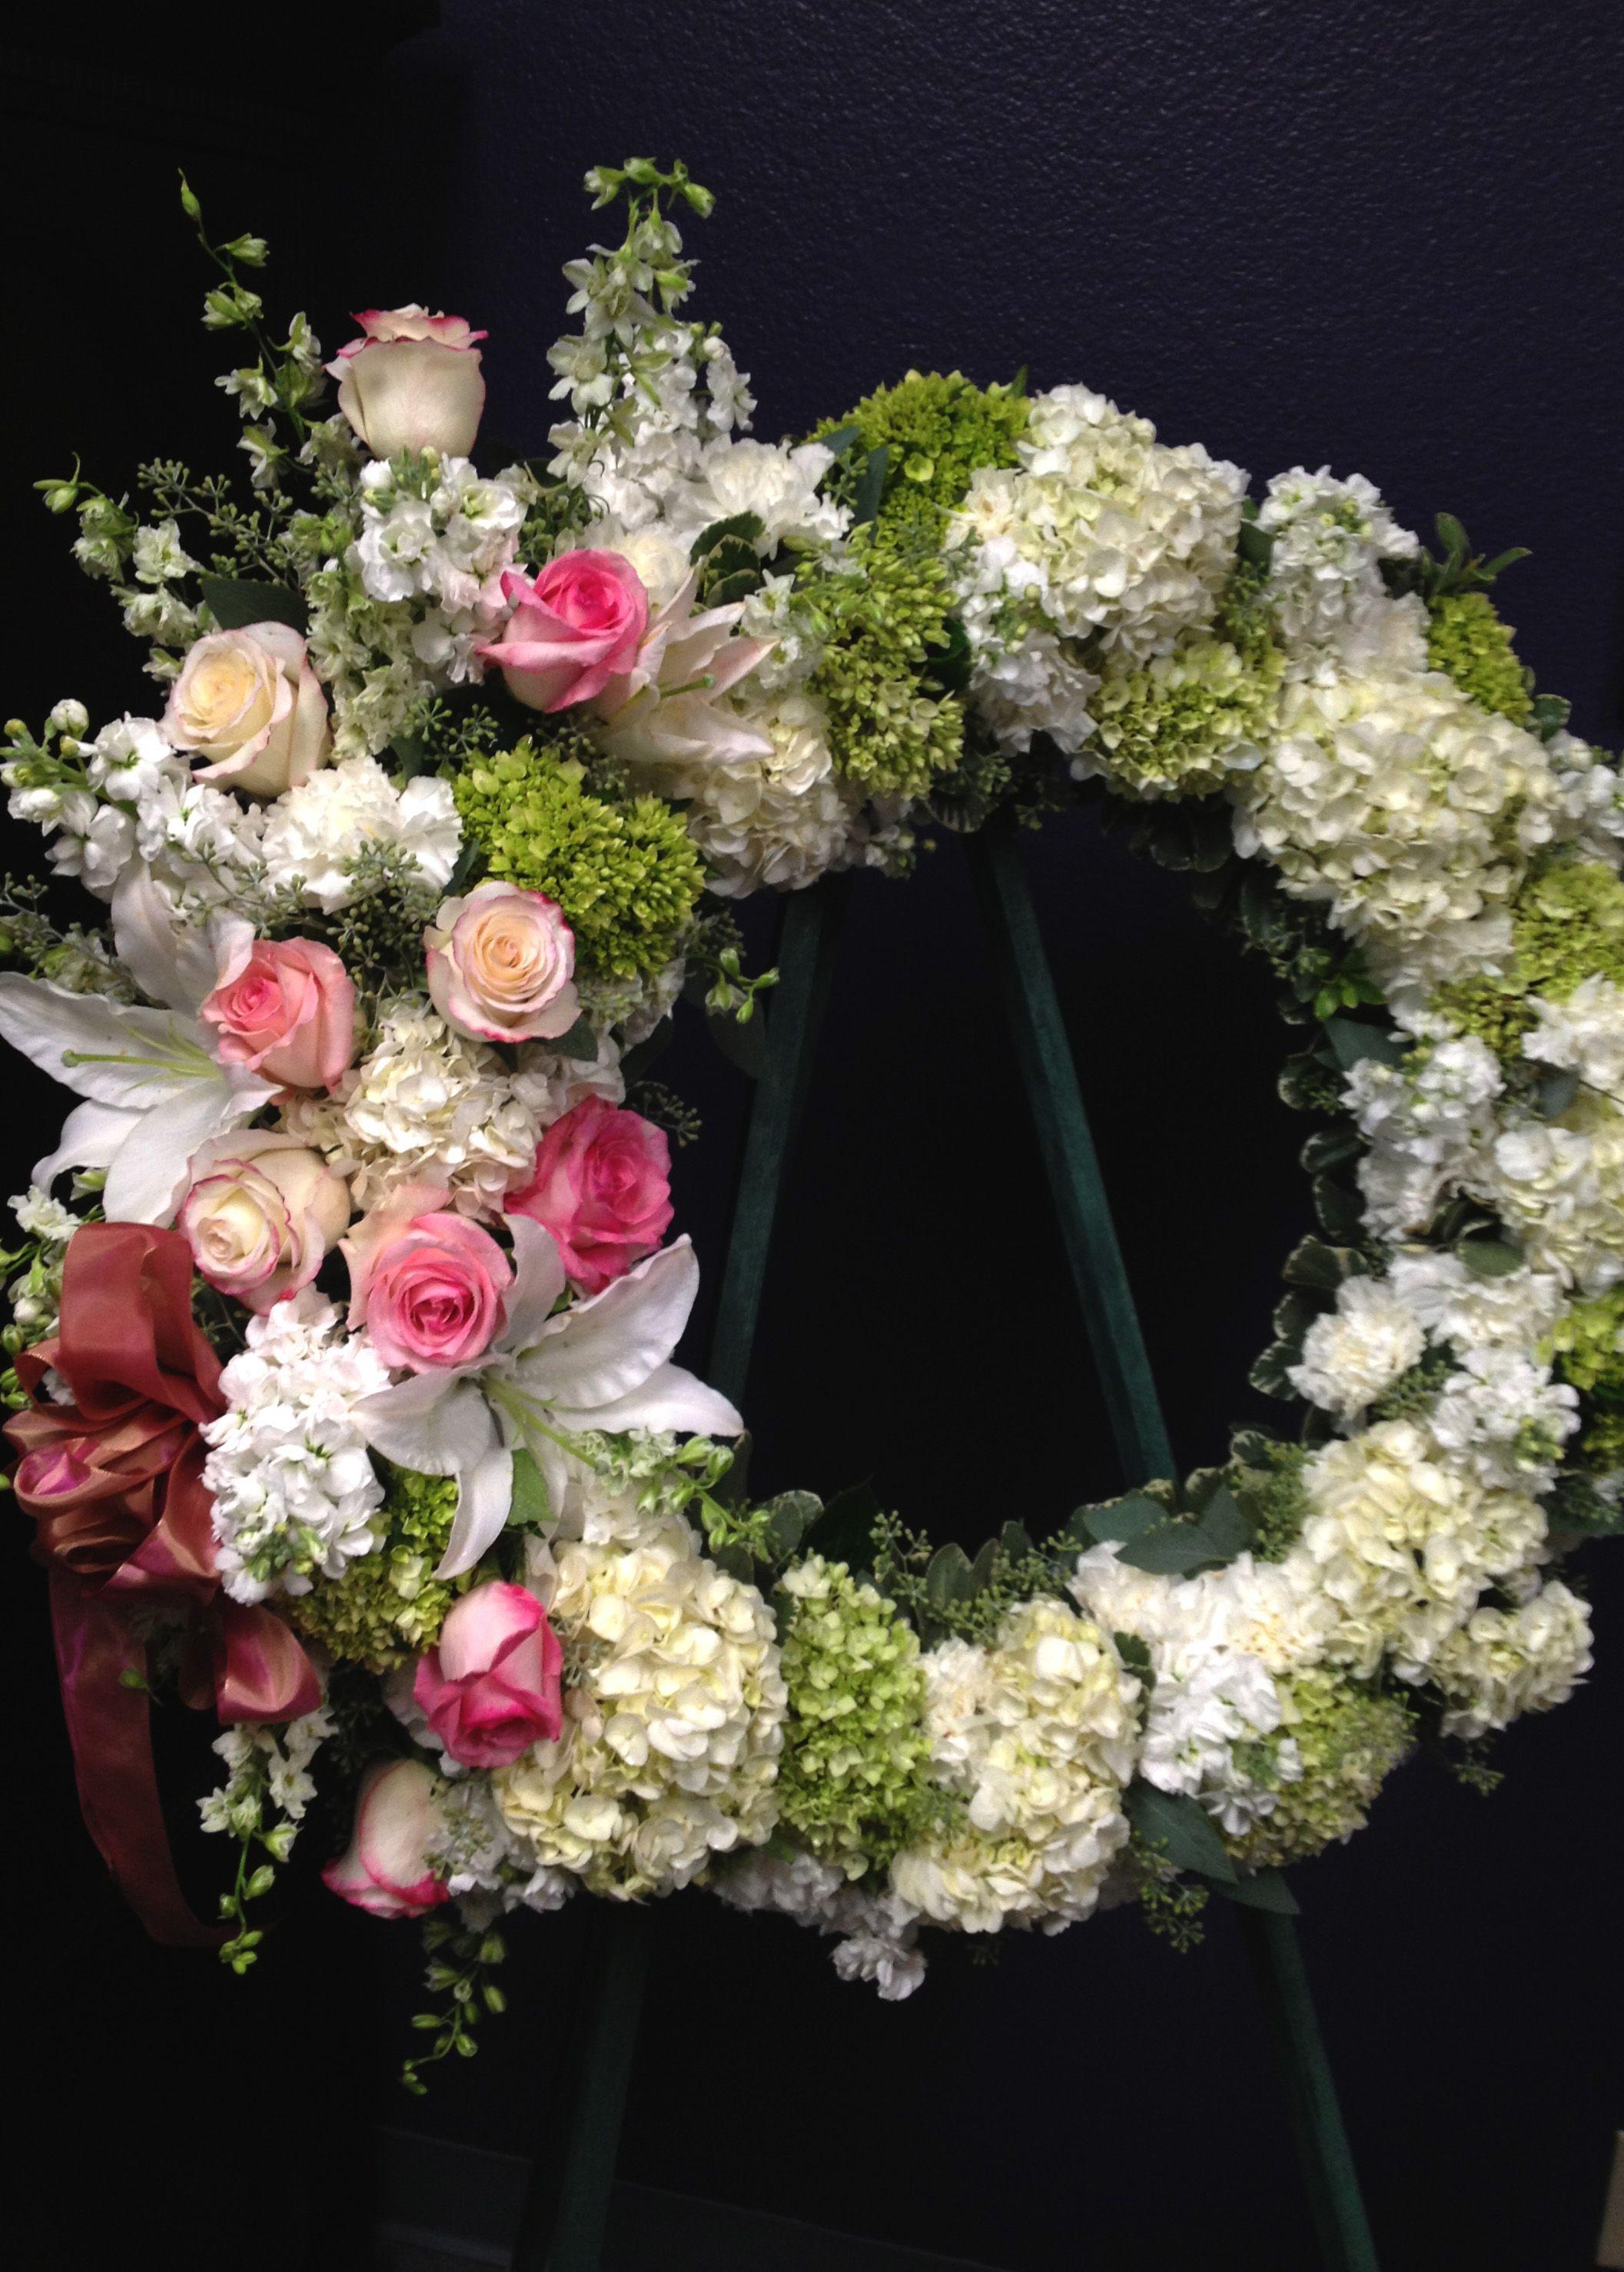 Pink white wreath2g 21132956 pixels flowersplants pink white wreath2g 21132956 pixels izmirmasajfo